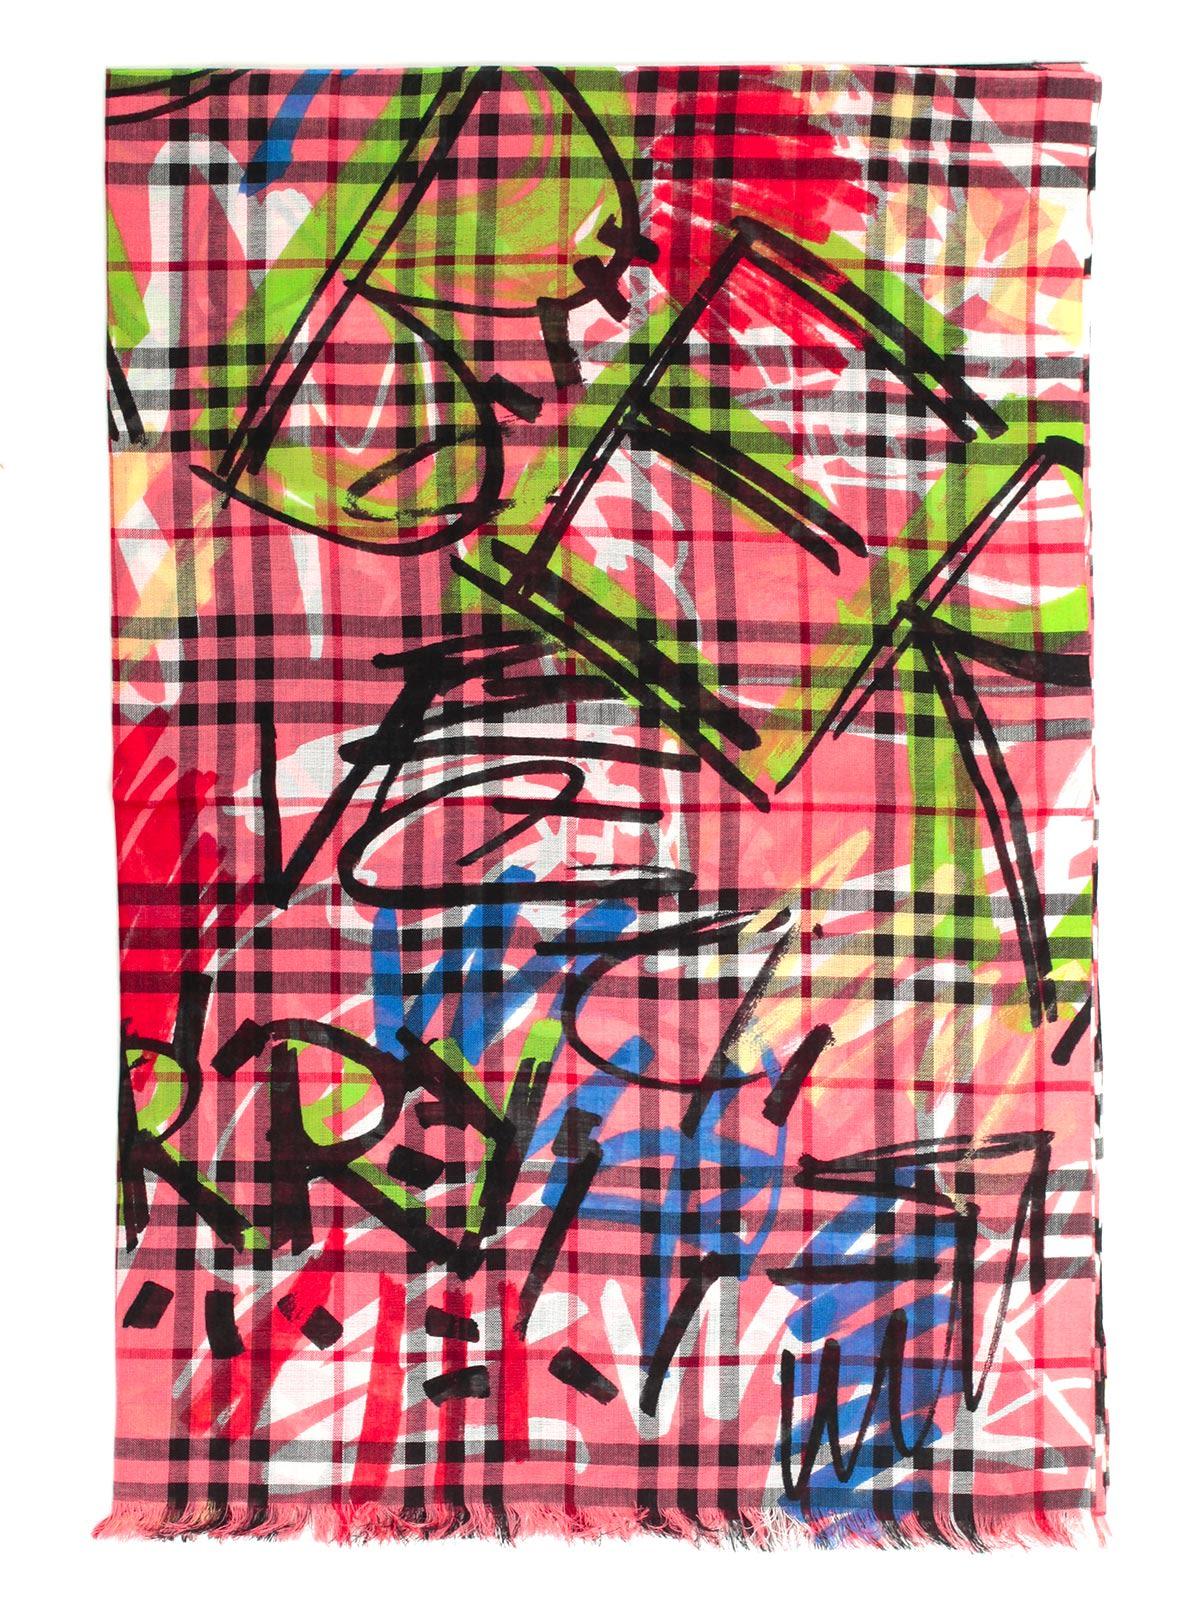 Burberry Graffiti Print Checkered Scarf